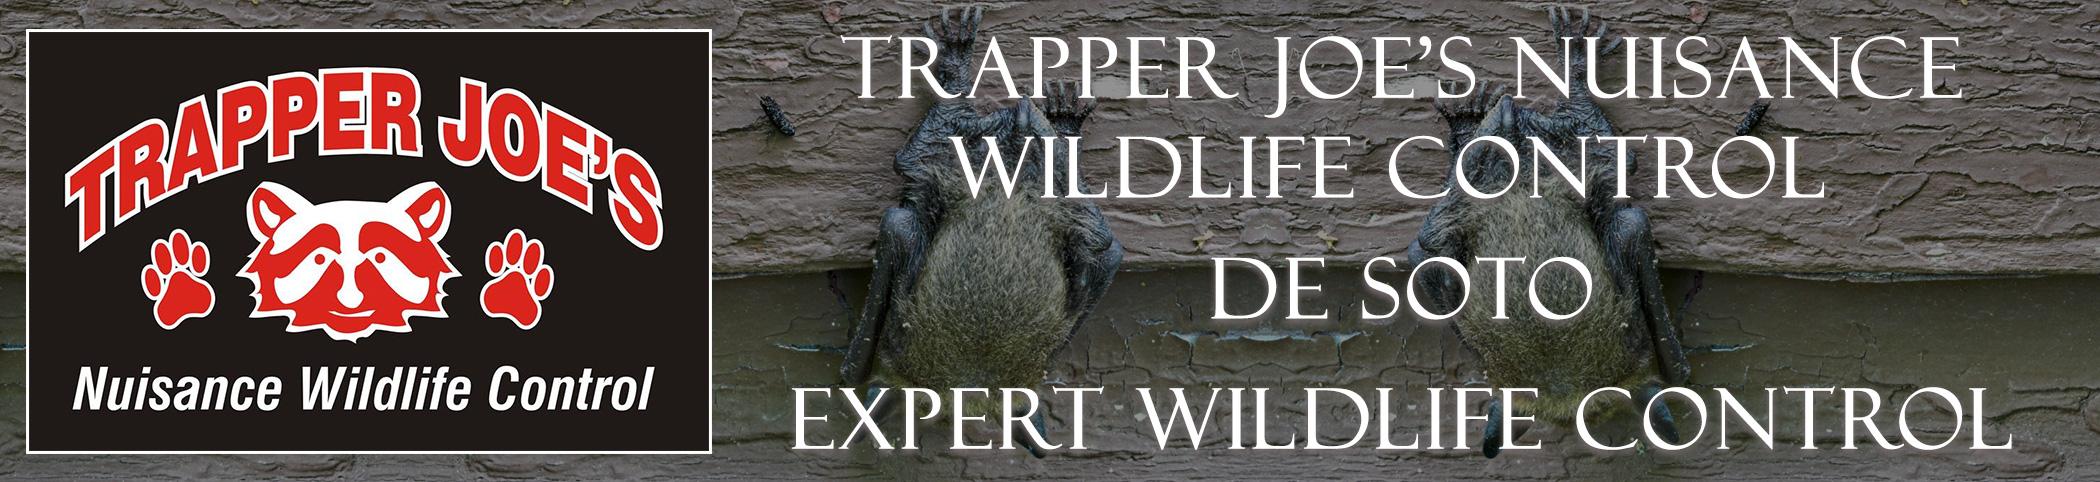 Trapper Joes De Soto Missouri header image